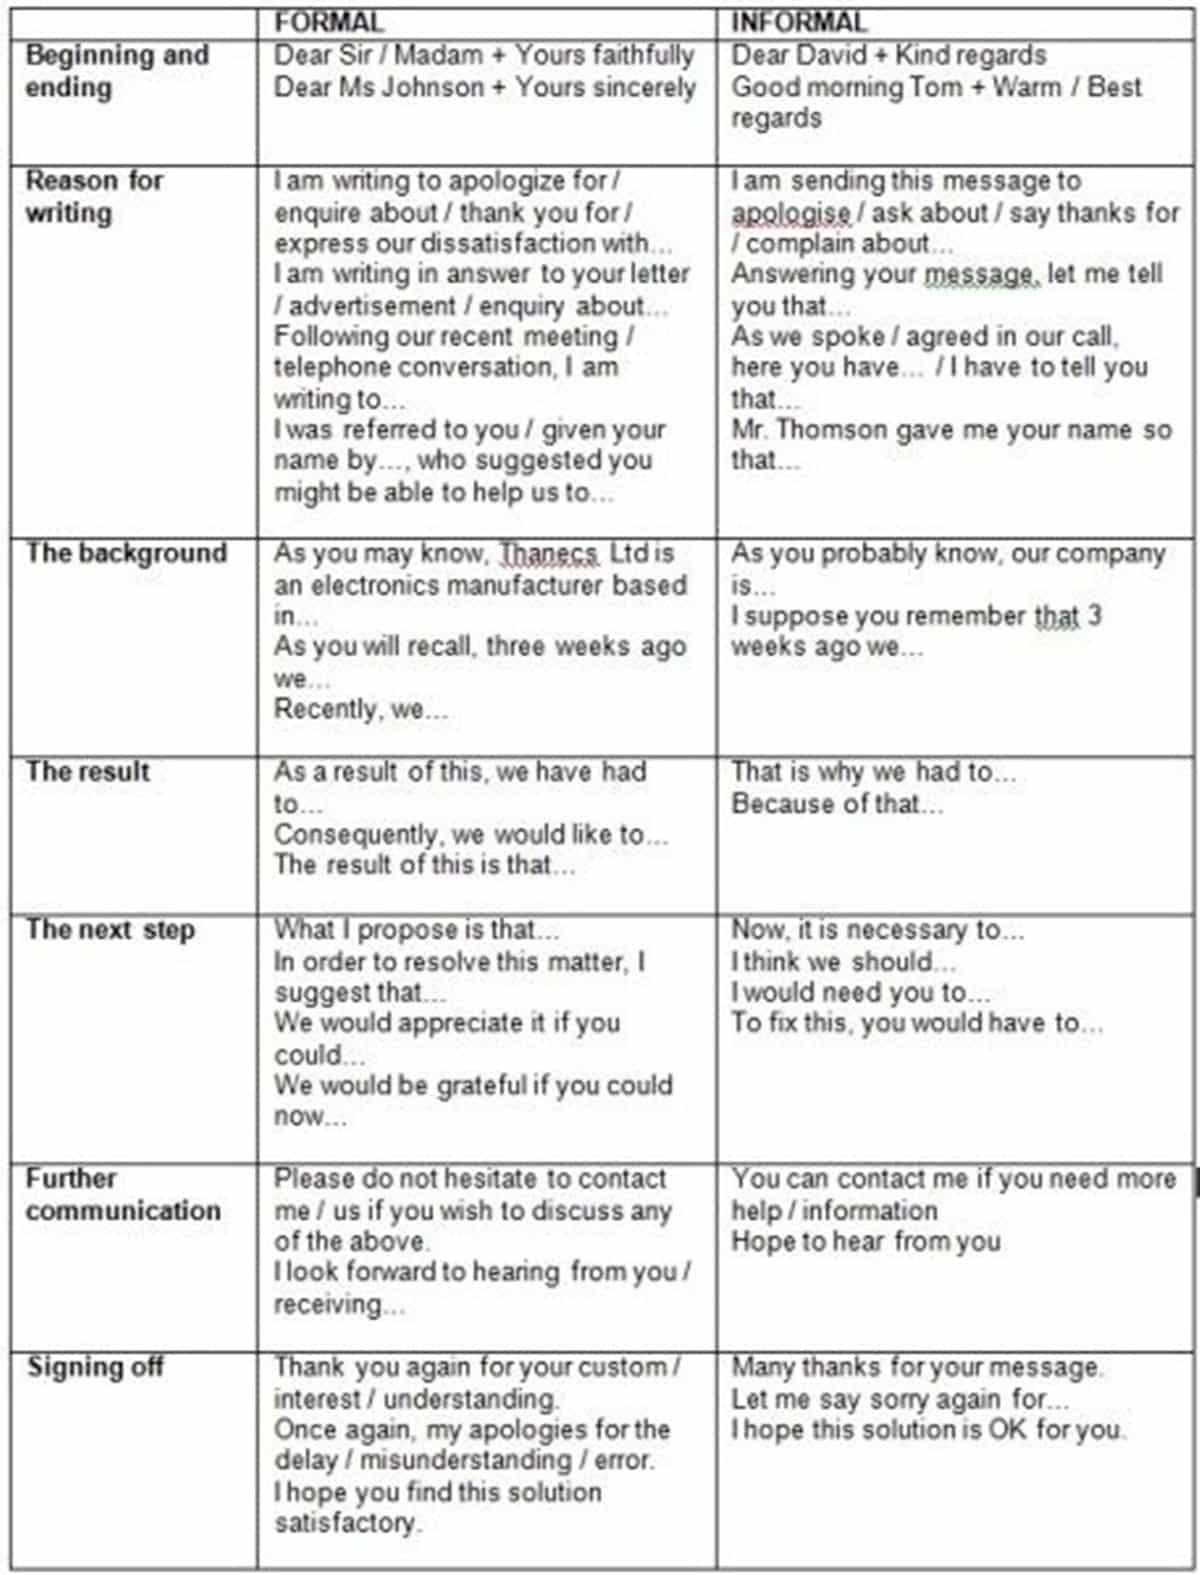 Formal vs. Informal Letters